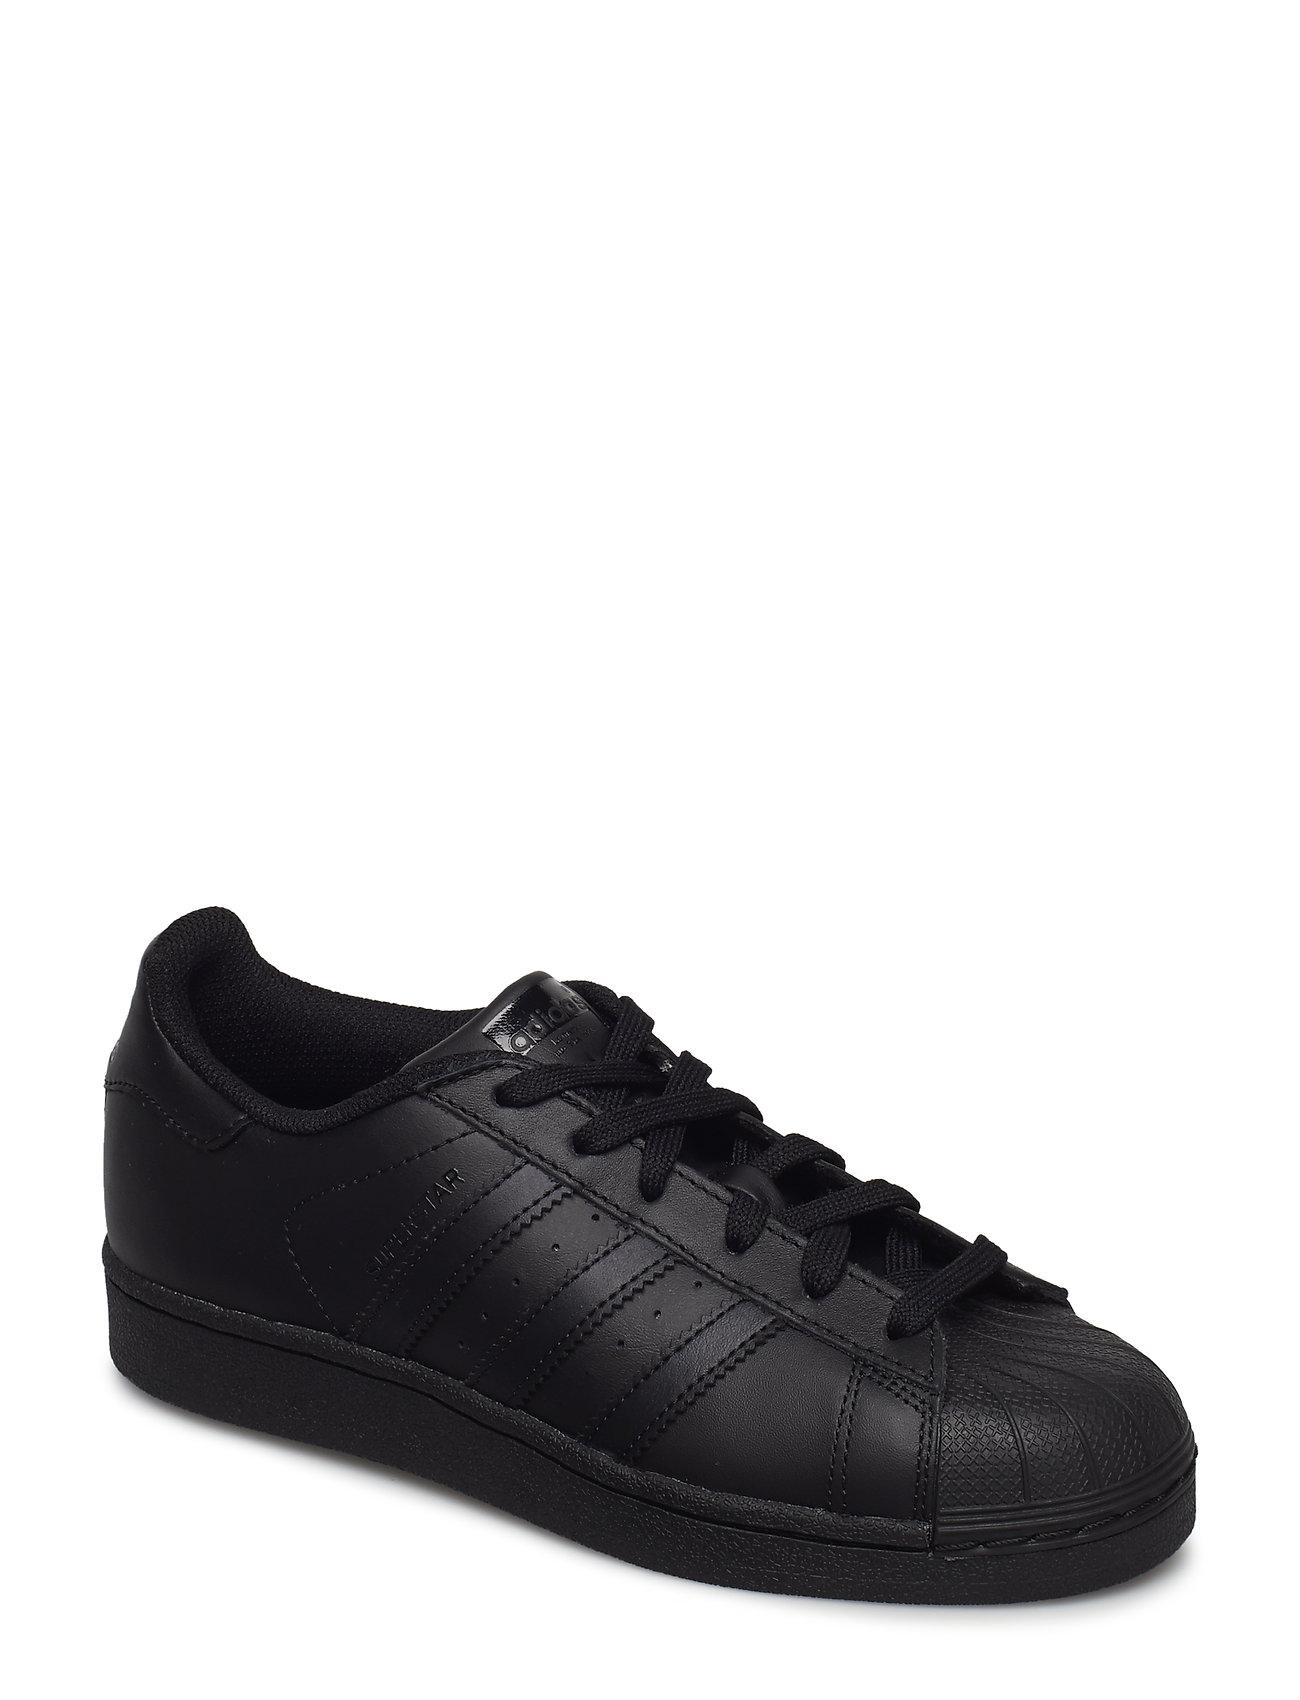 adidas Originals Superstar J - CBLACK/CBLACK/CBLACK